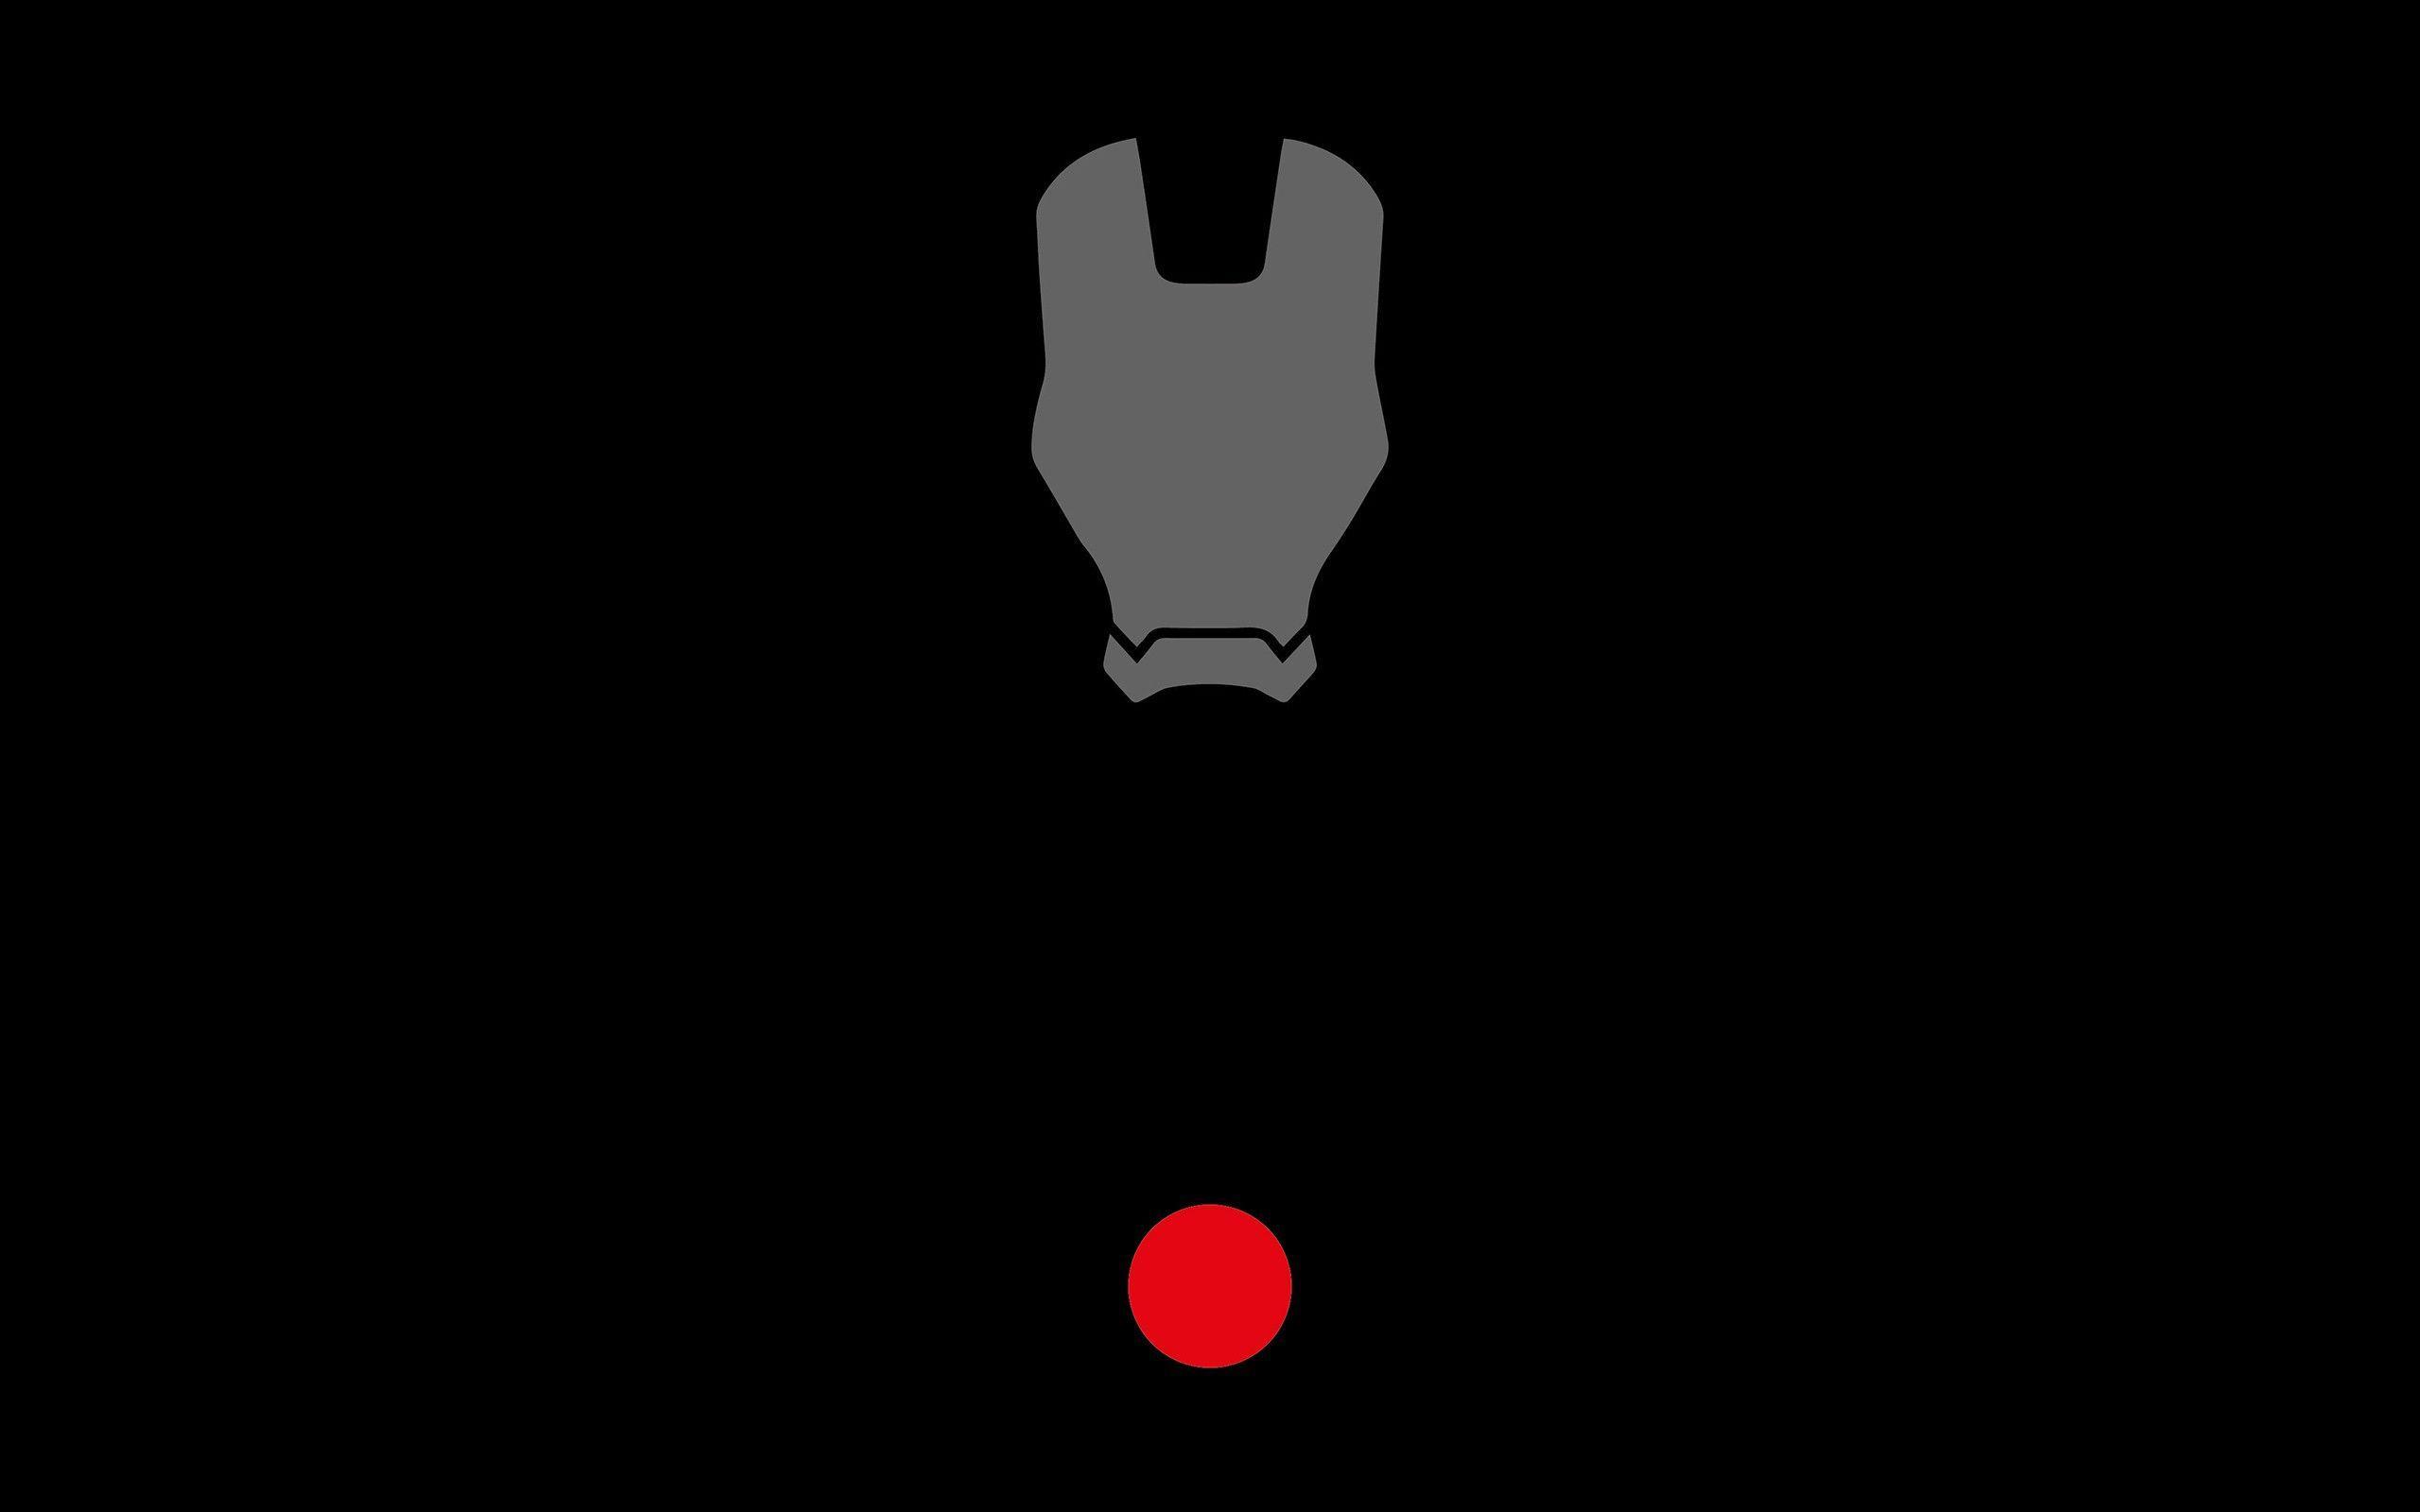 Iron Man Black Wallpapers Wallpaper Cave